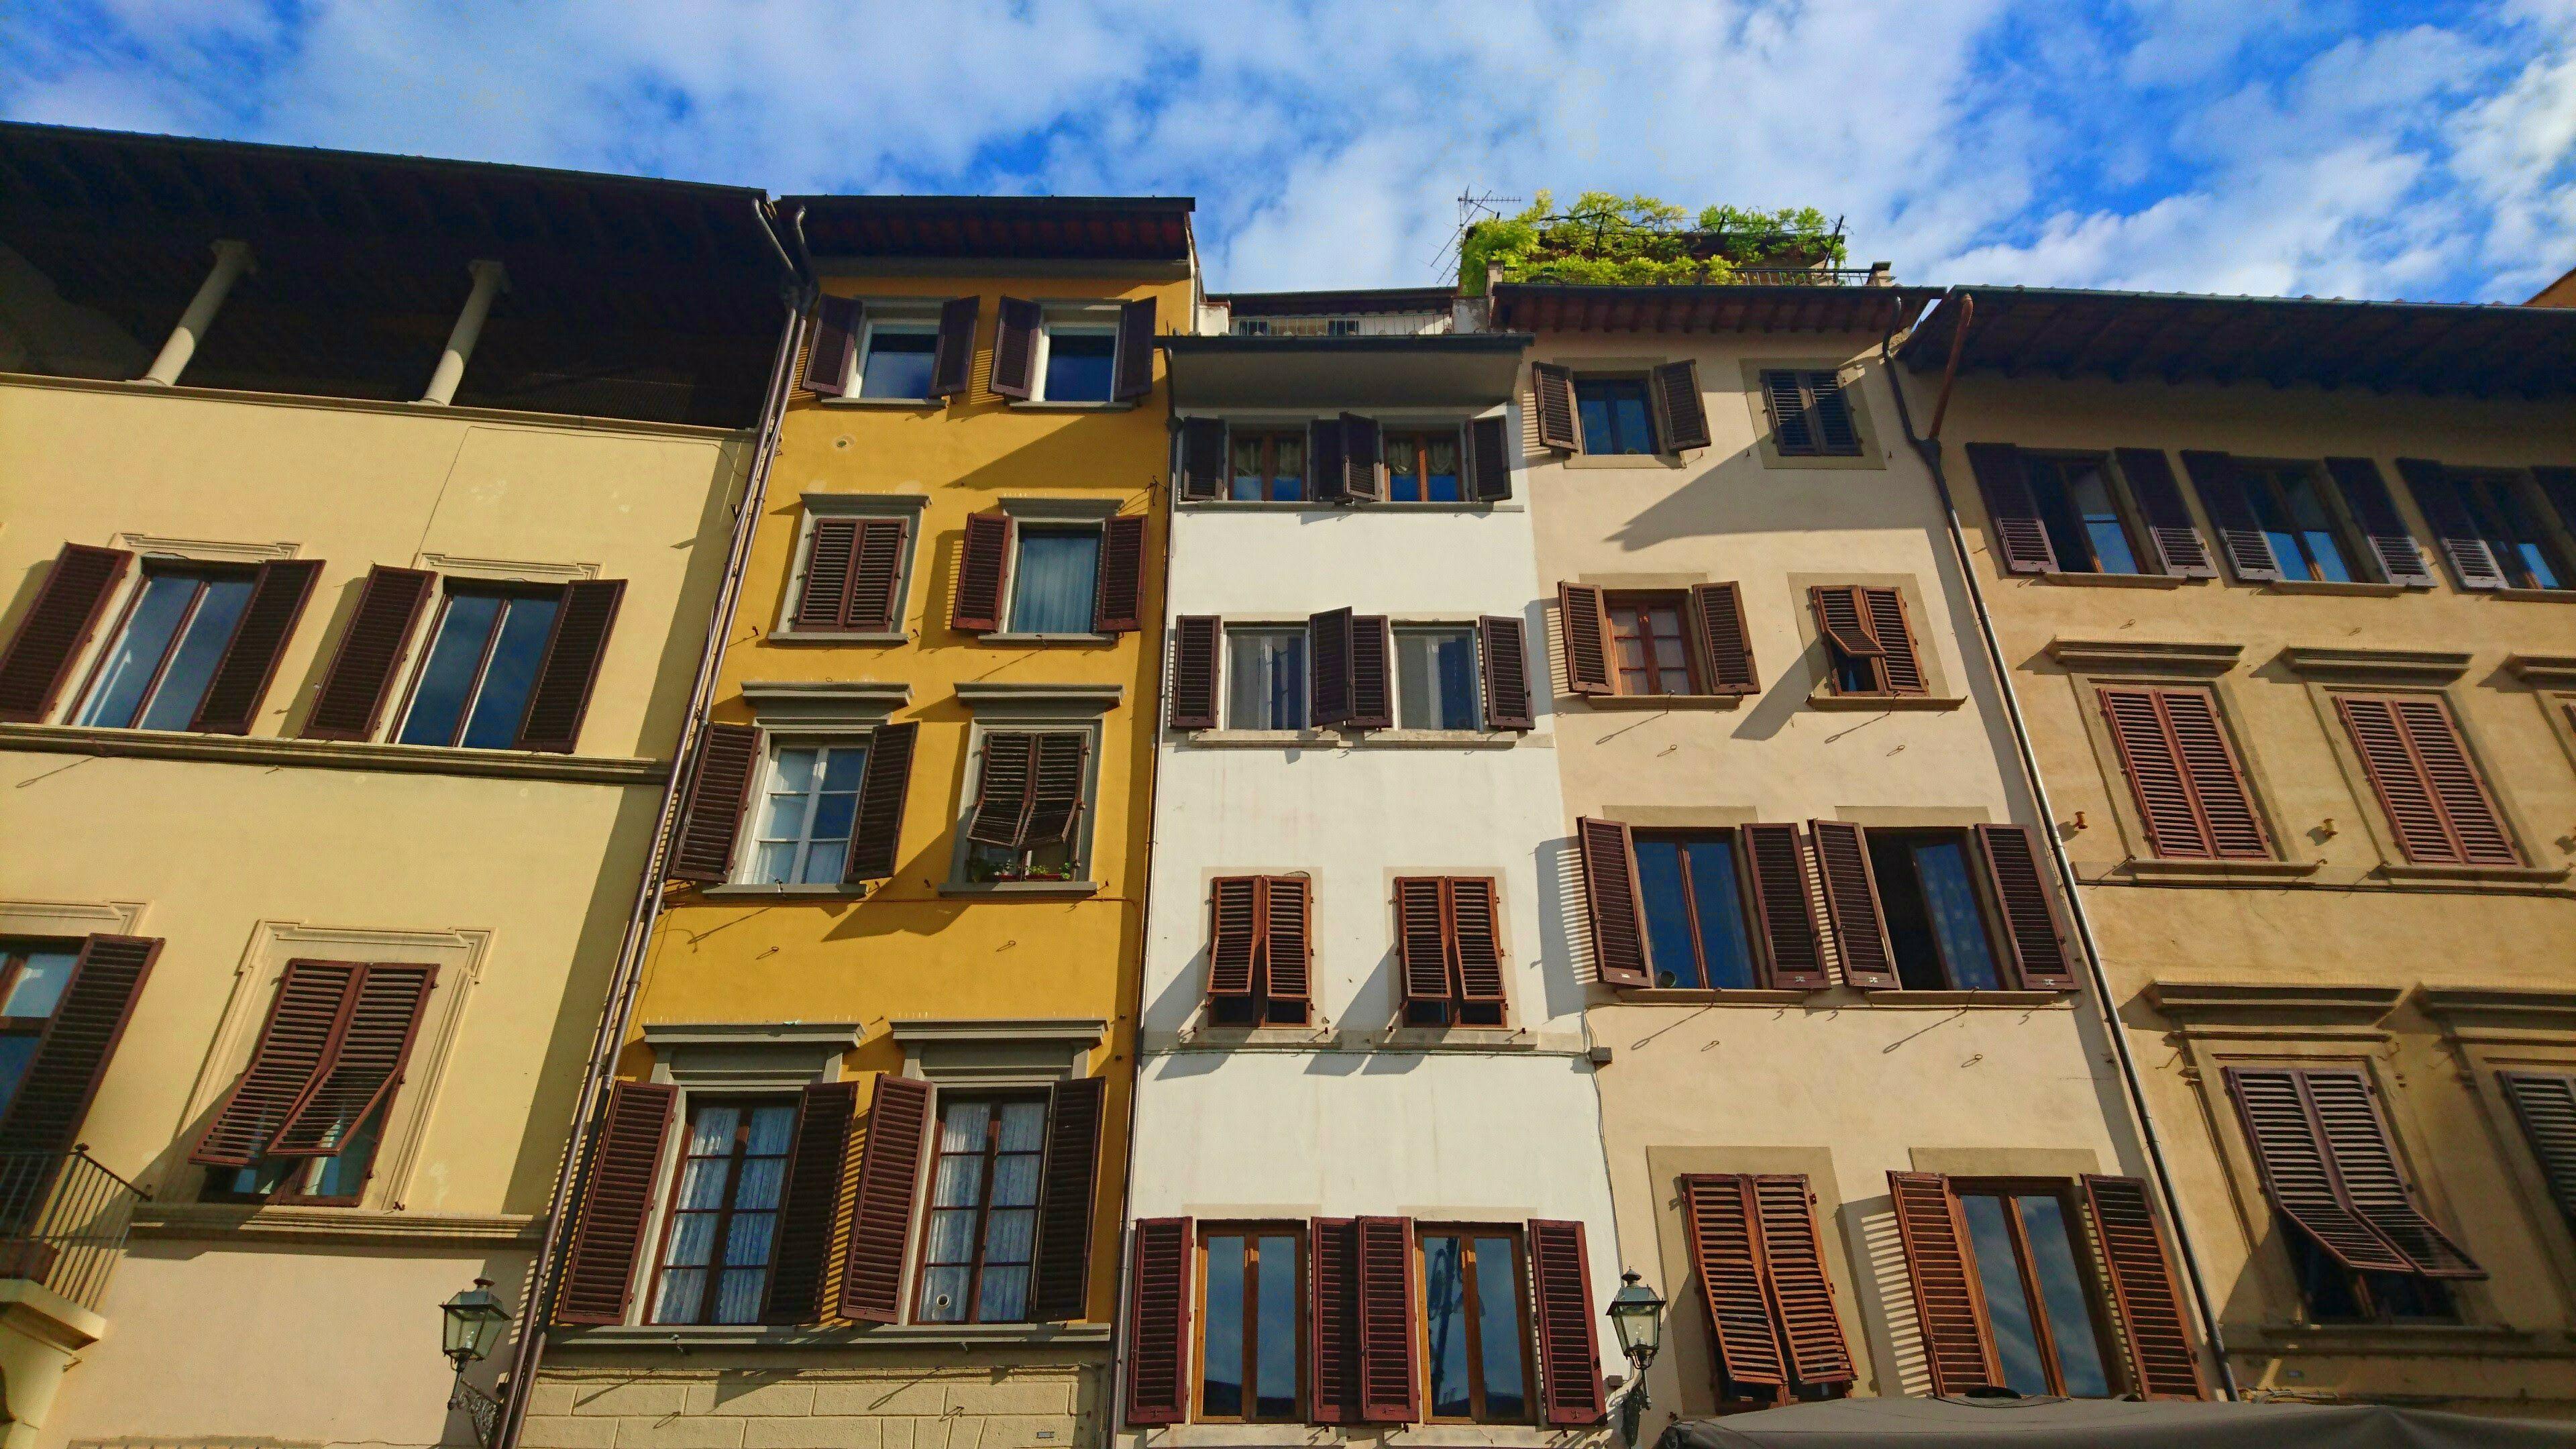 Piazza di Santa Croce, Florence Copyright @ TheDaydreamingTourist www.thedaydreamingtourist.com